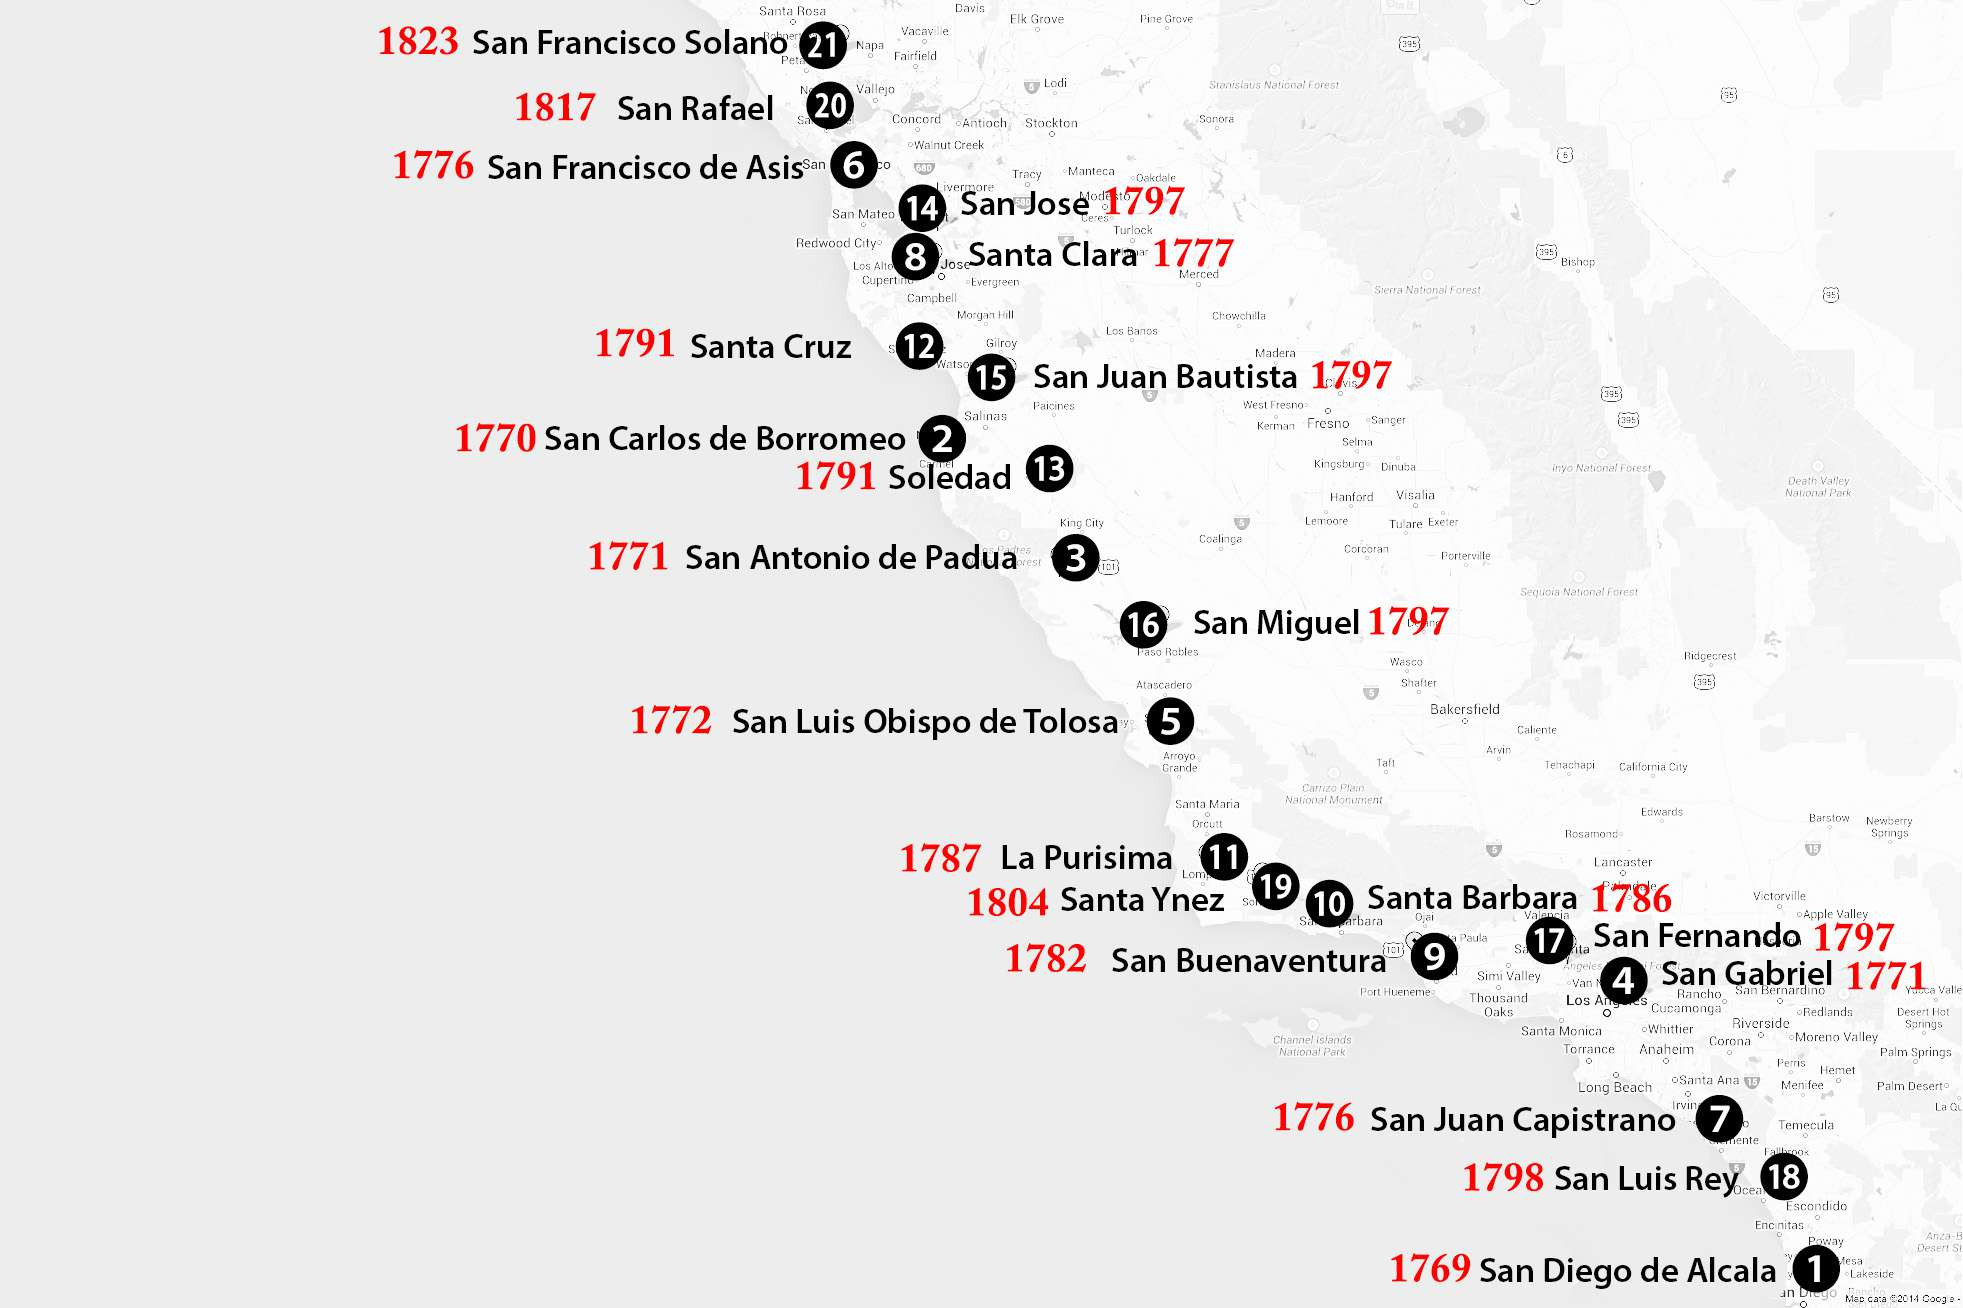 Google Maps Santa Barbara California Detailed California Missions - Google Maps Santa Cruz California